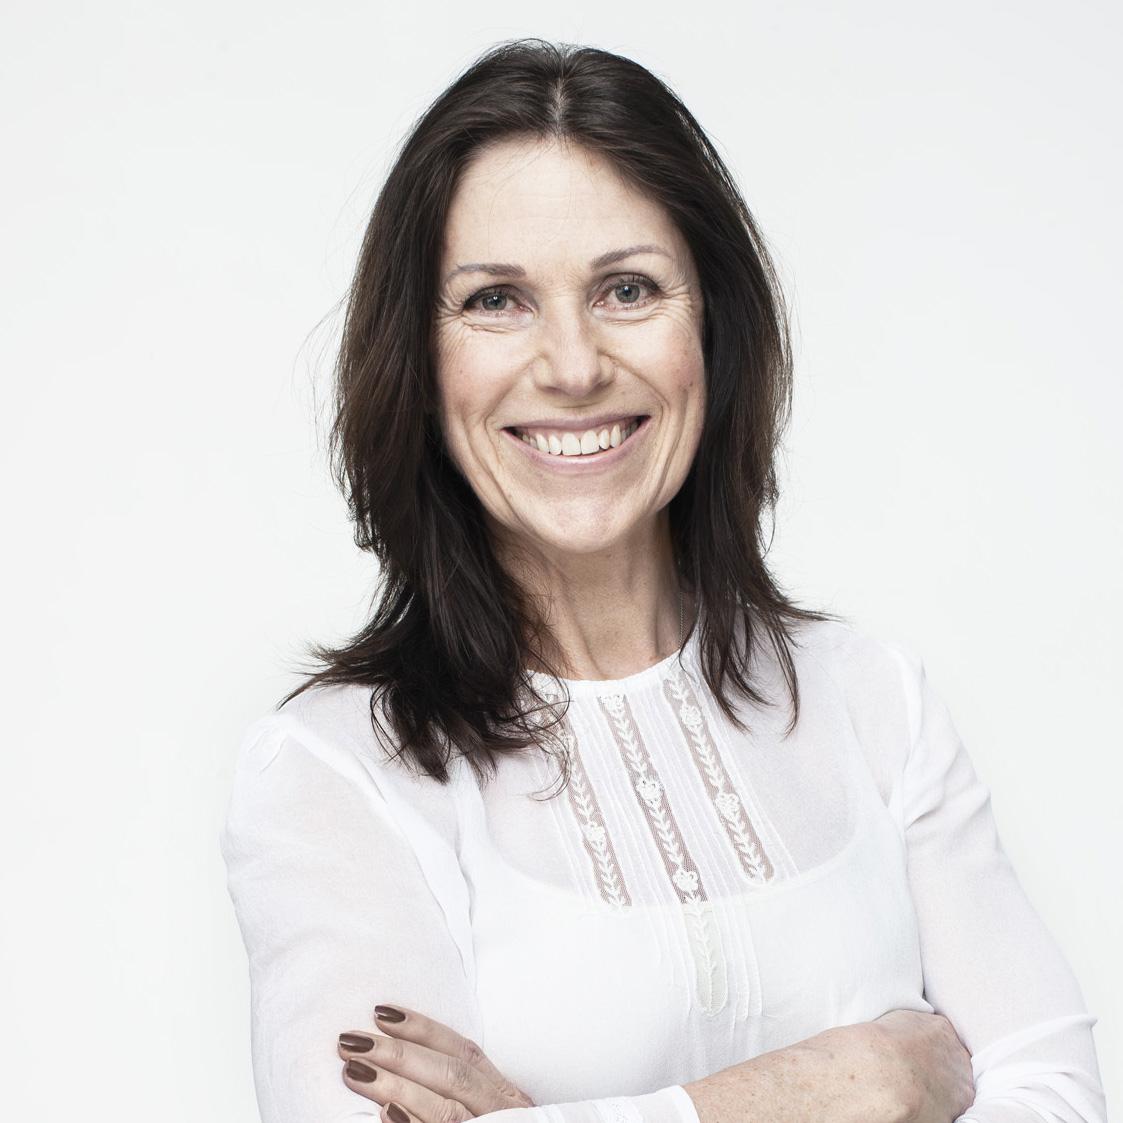 Åsa Severgårdh_CEO_Epassi Sweden-1